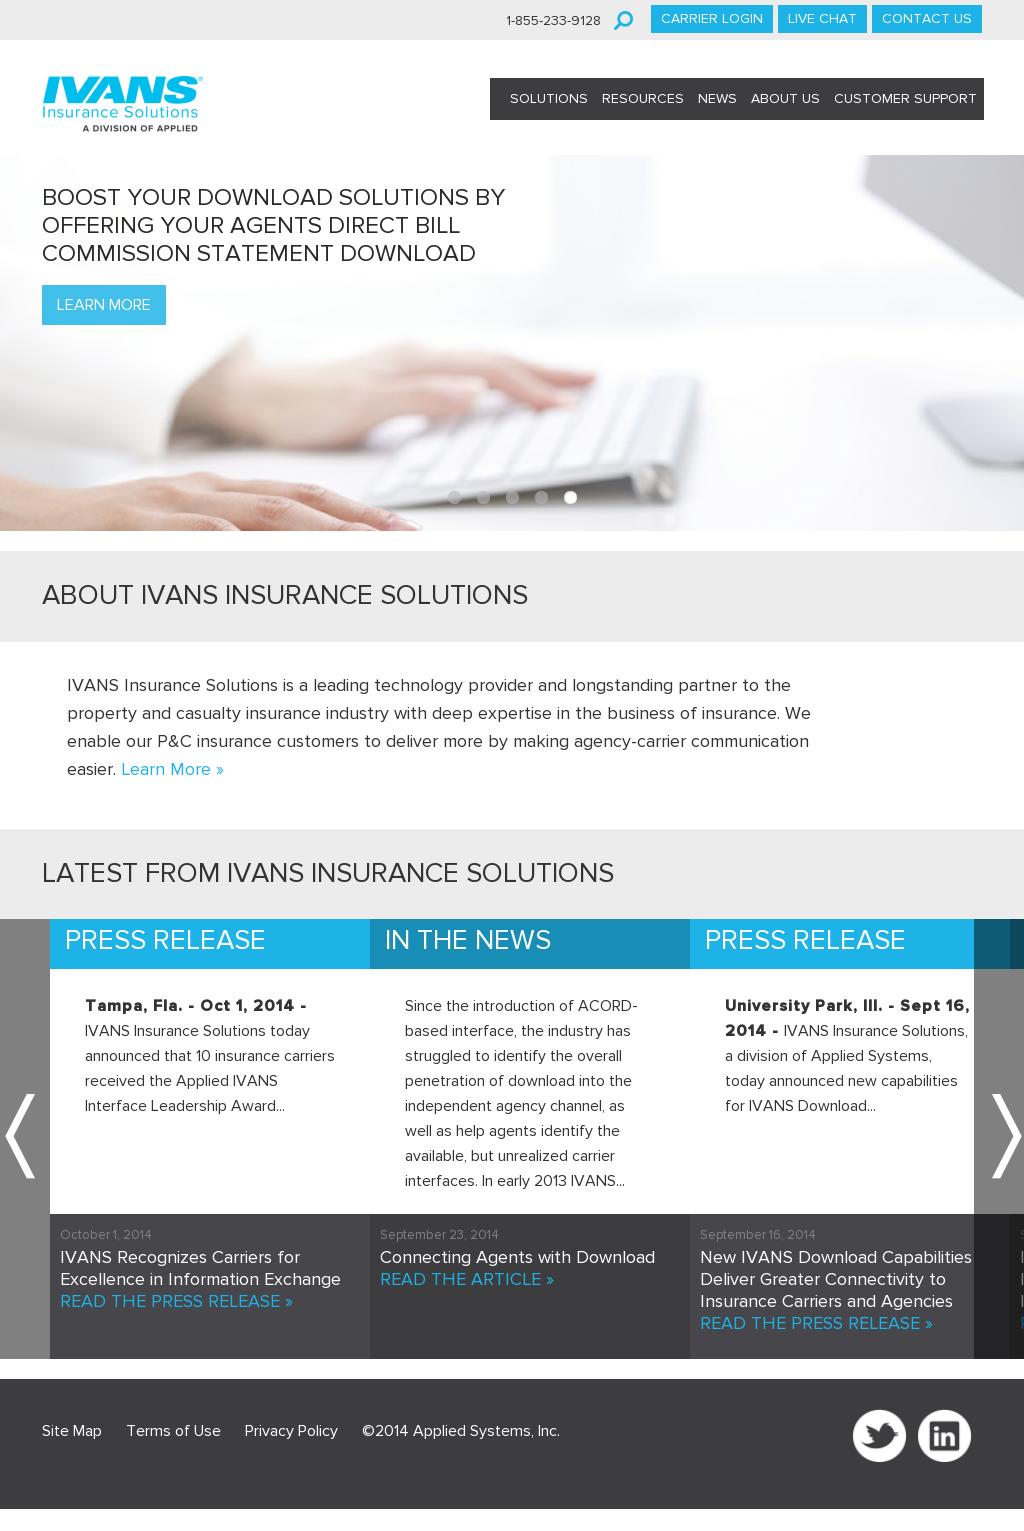 Owler Reports - IVANS Insurance Solutions: IVANS Releases